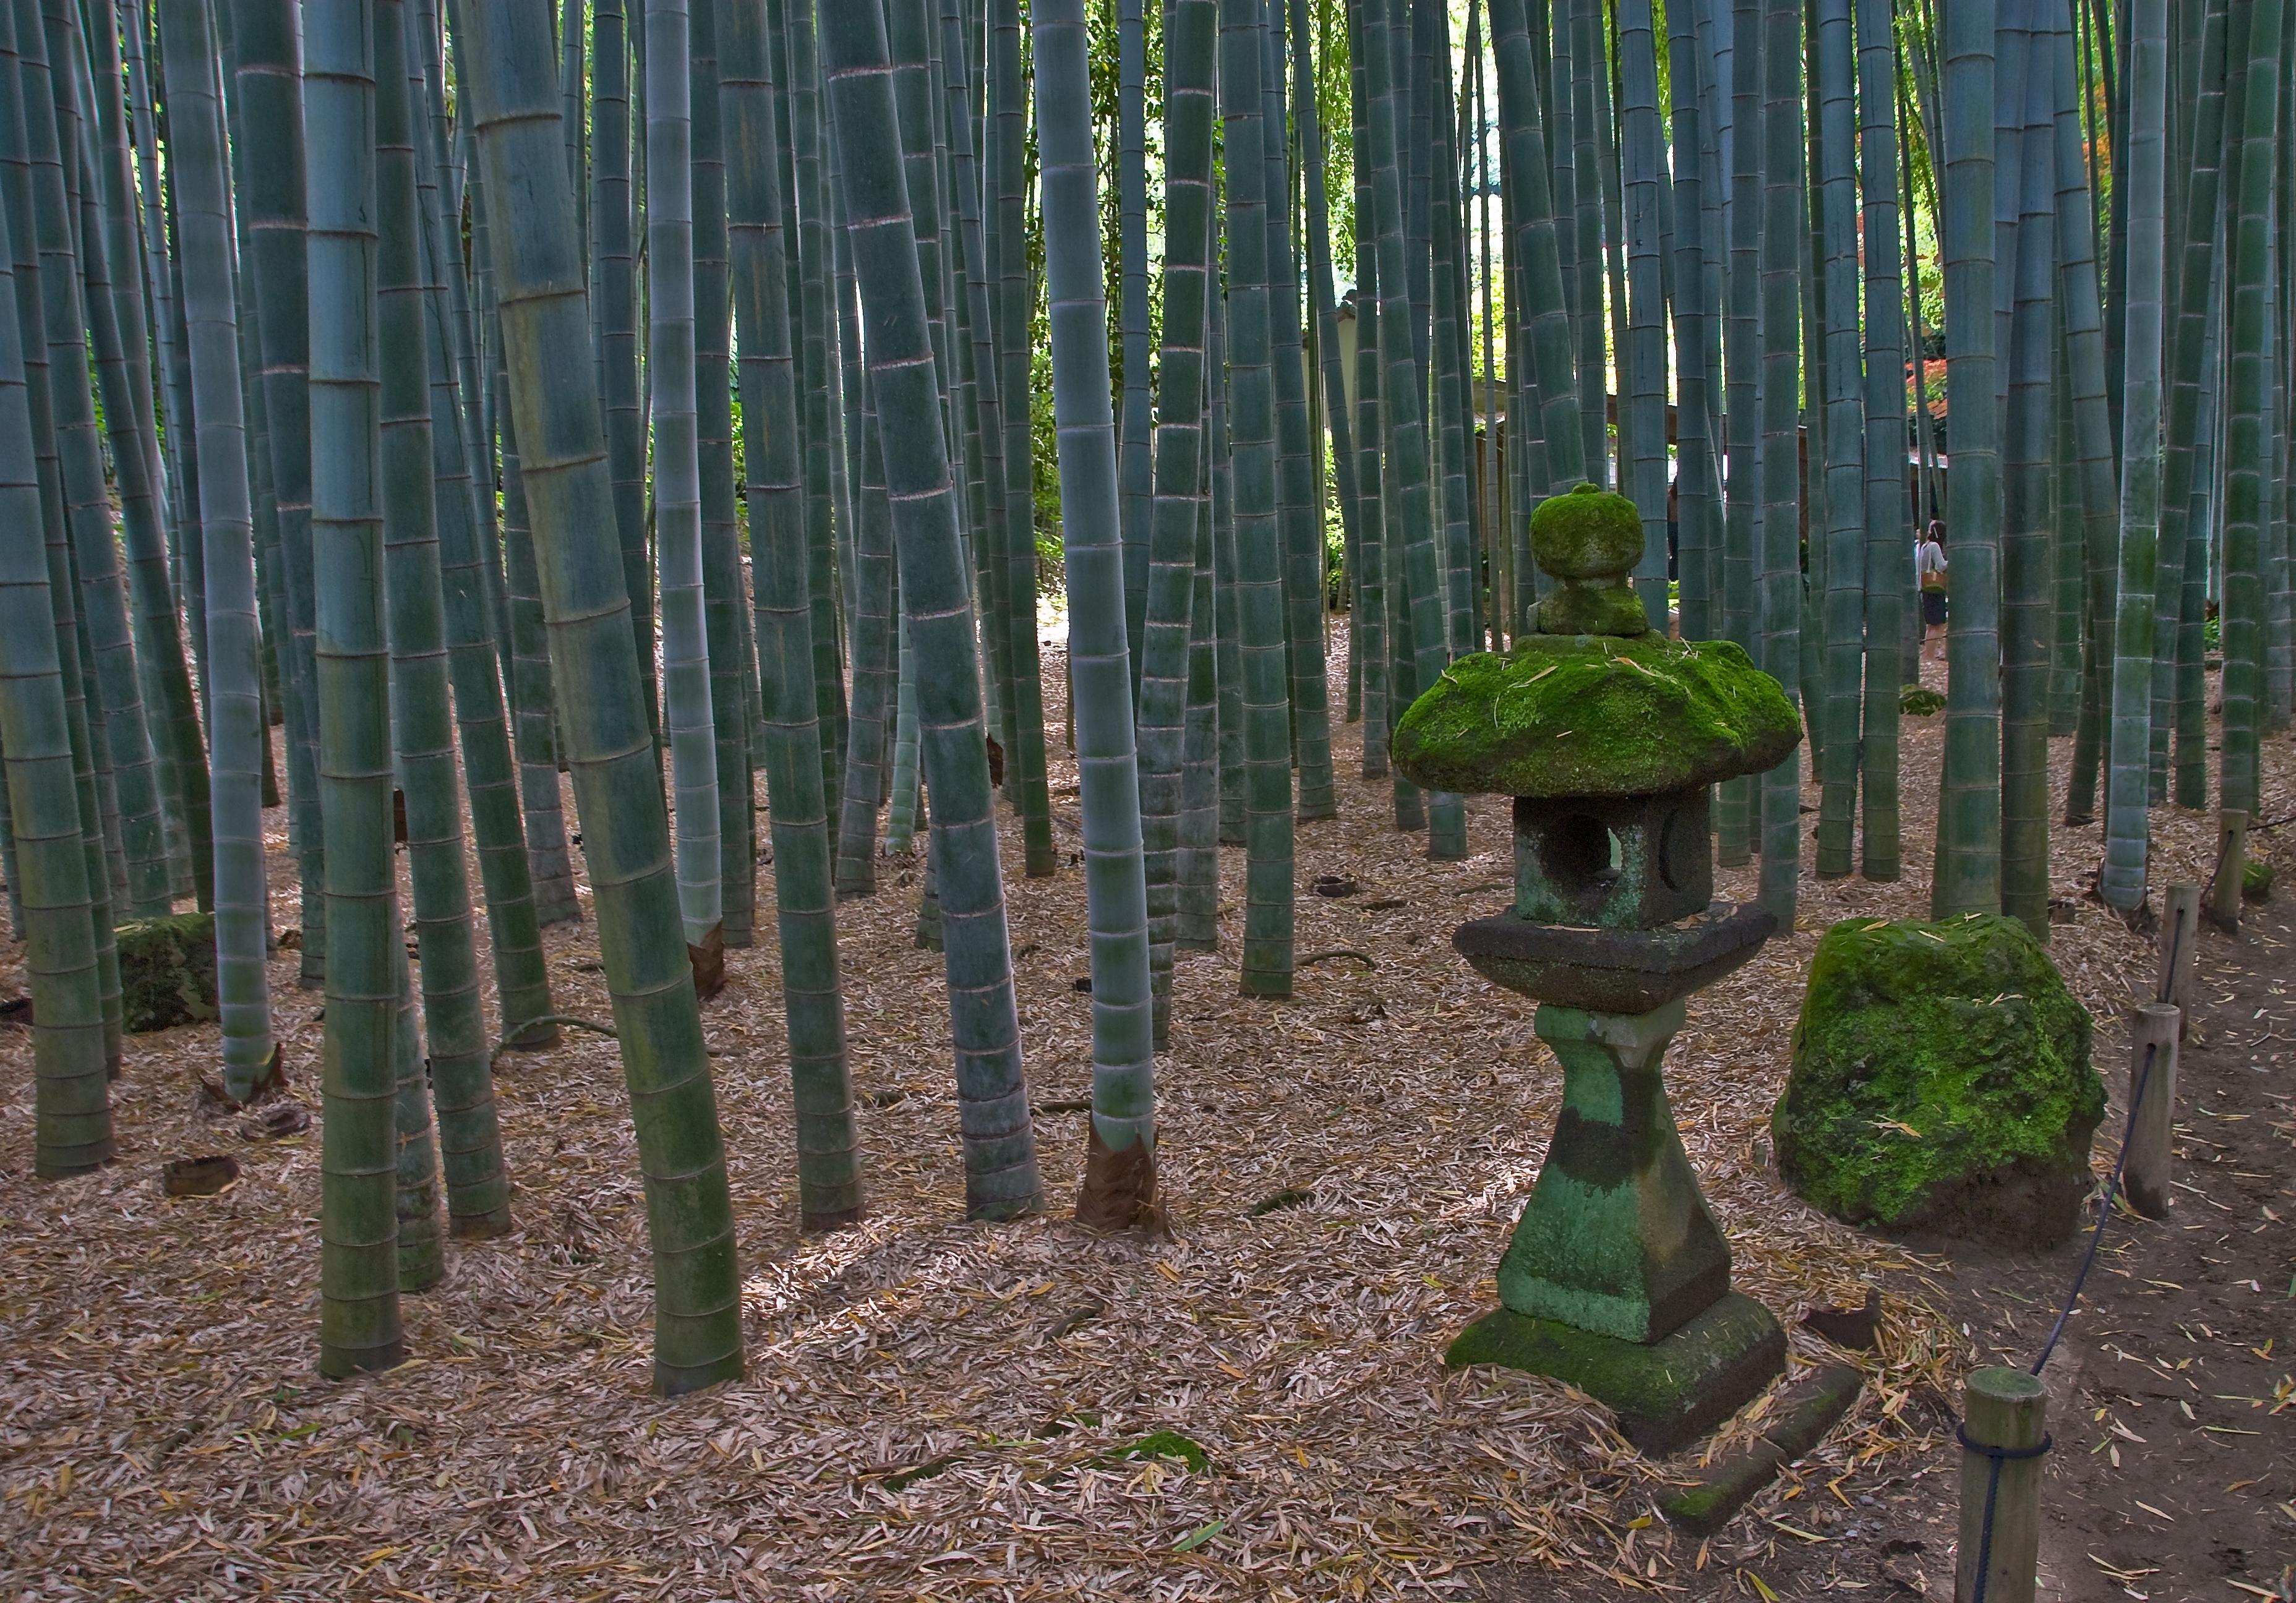 FileHokokuji Bamboo Forest Kamakurajpg Wikipedia